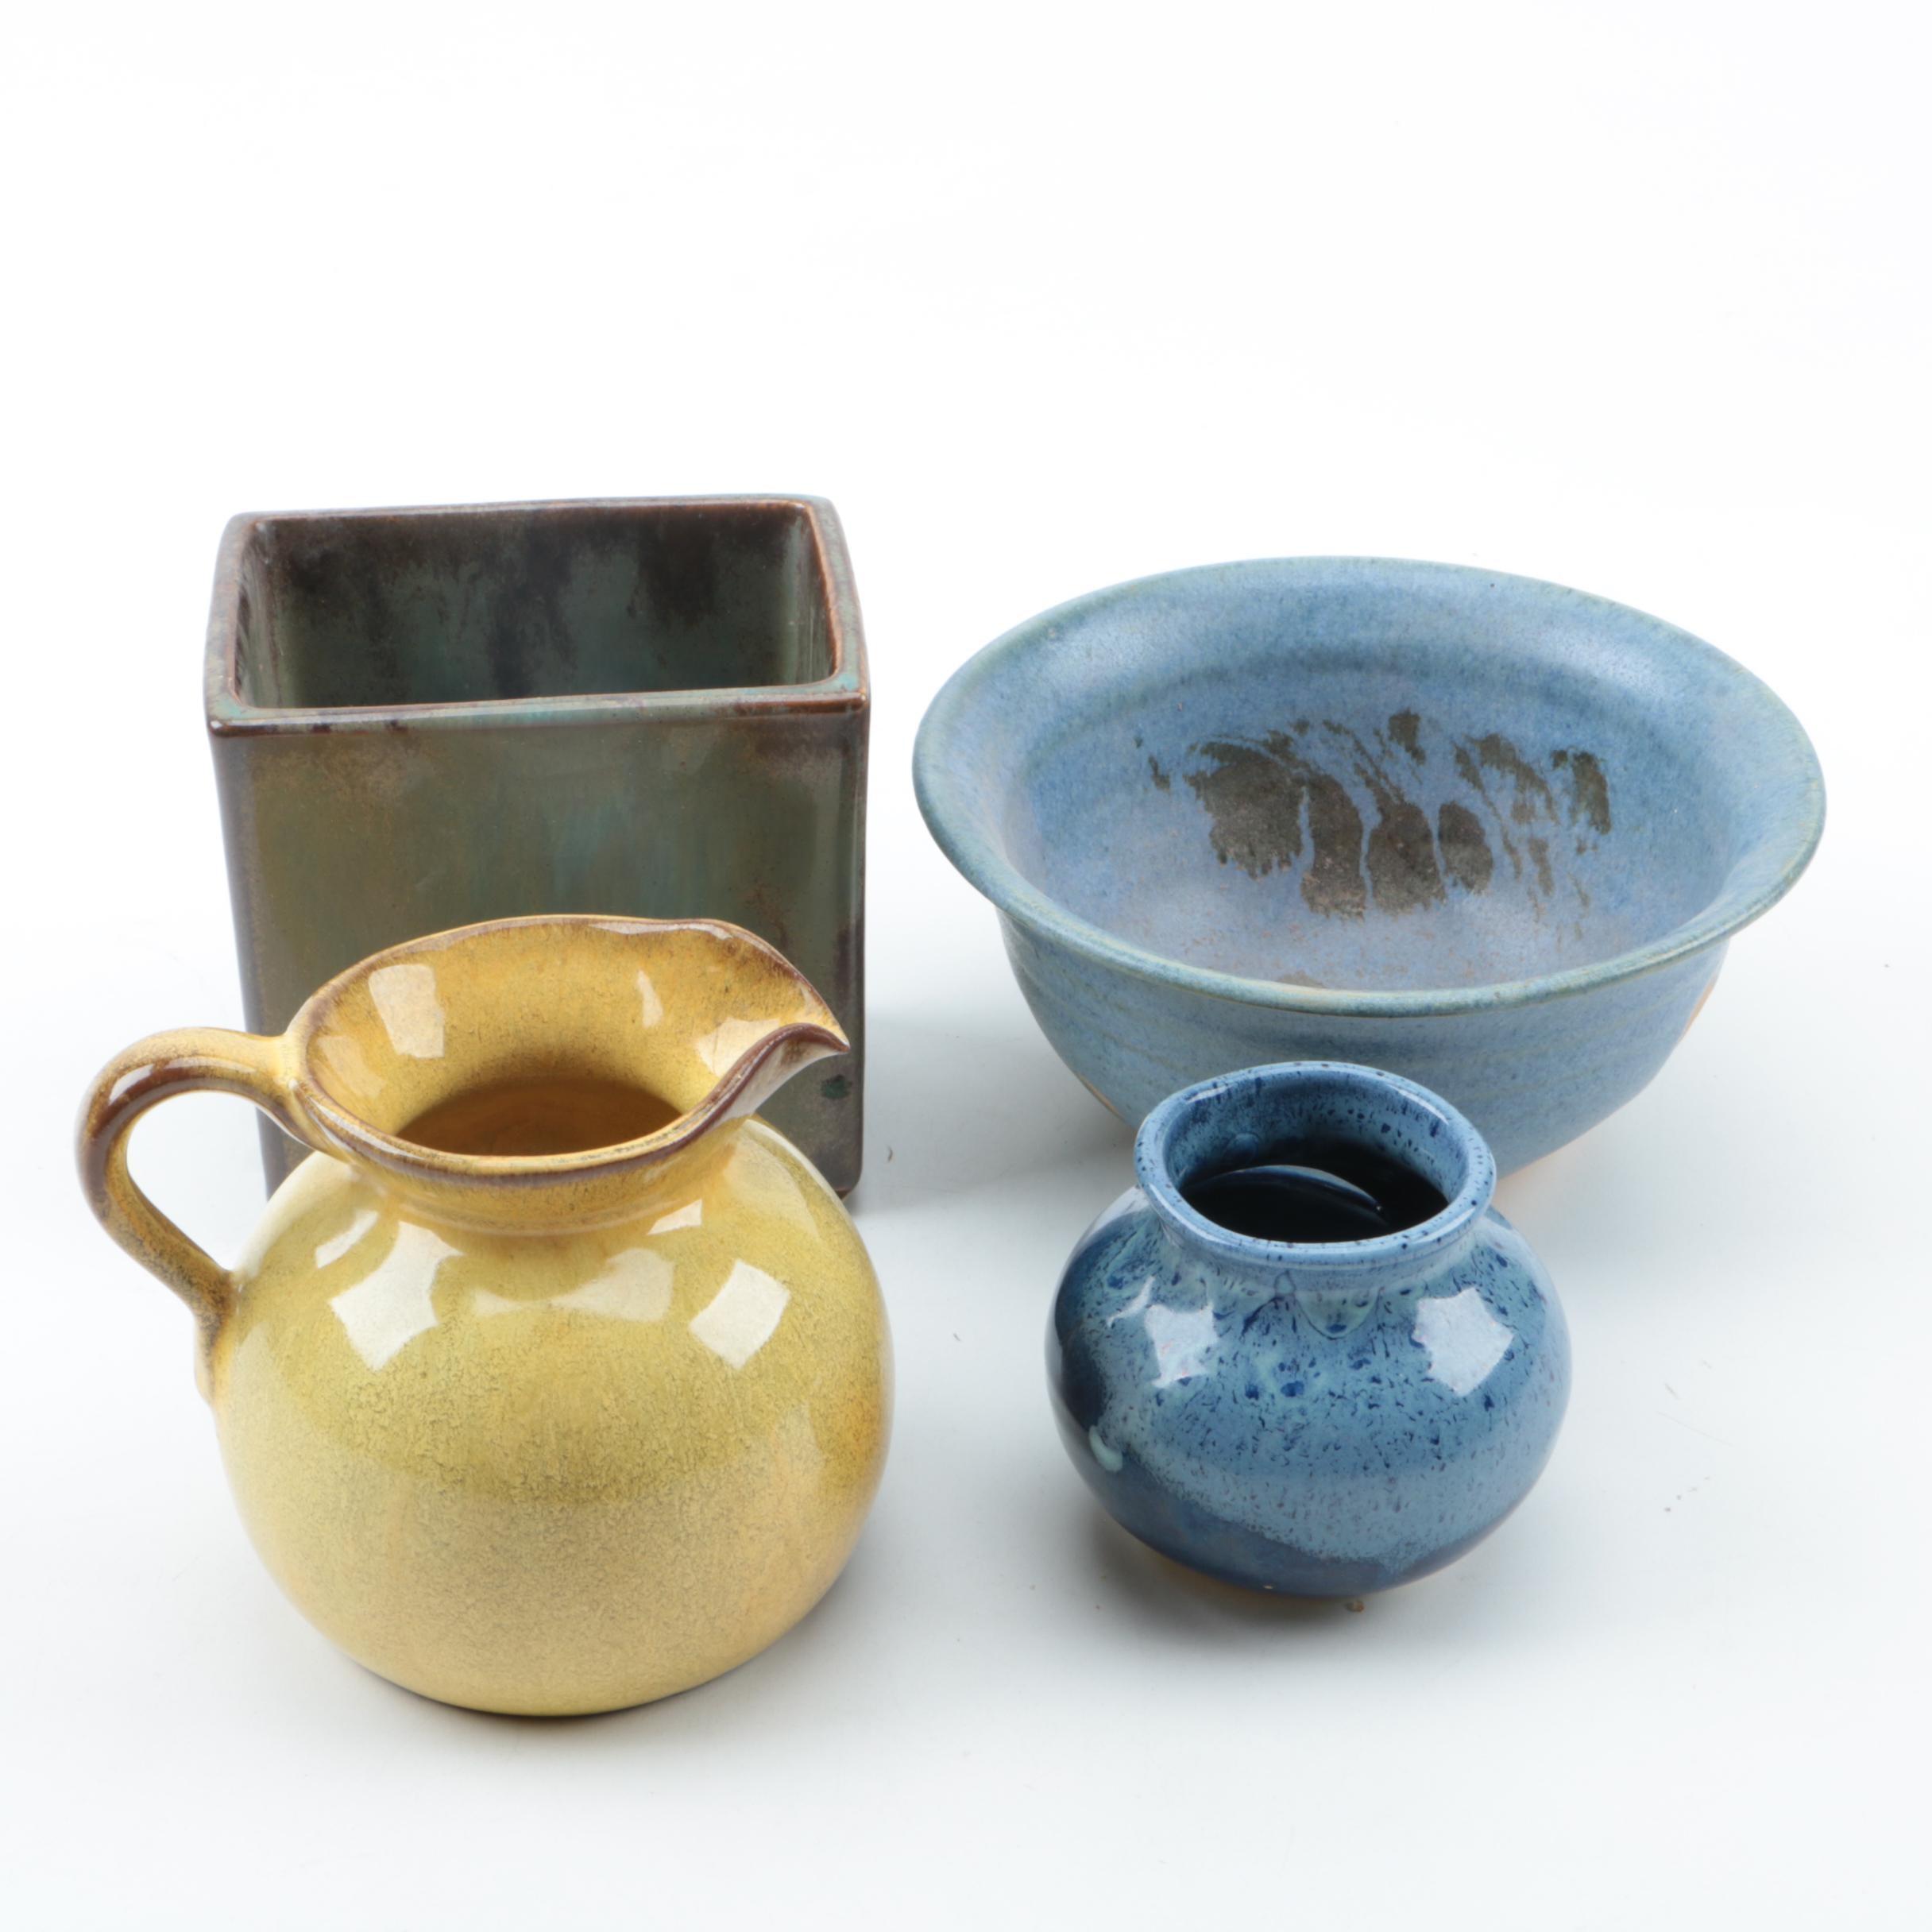 Nicodemus Yellow Glazed Pottery Pitcher and More